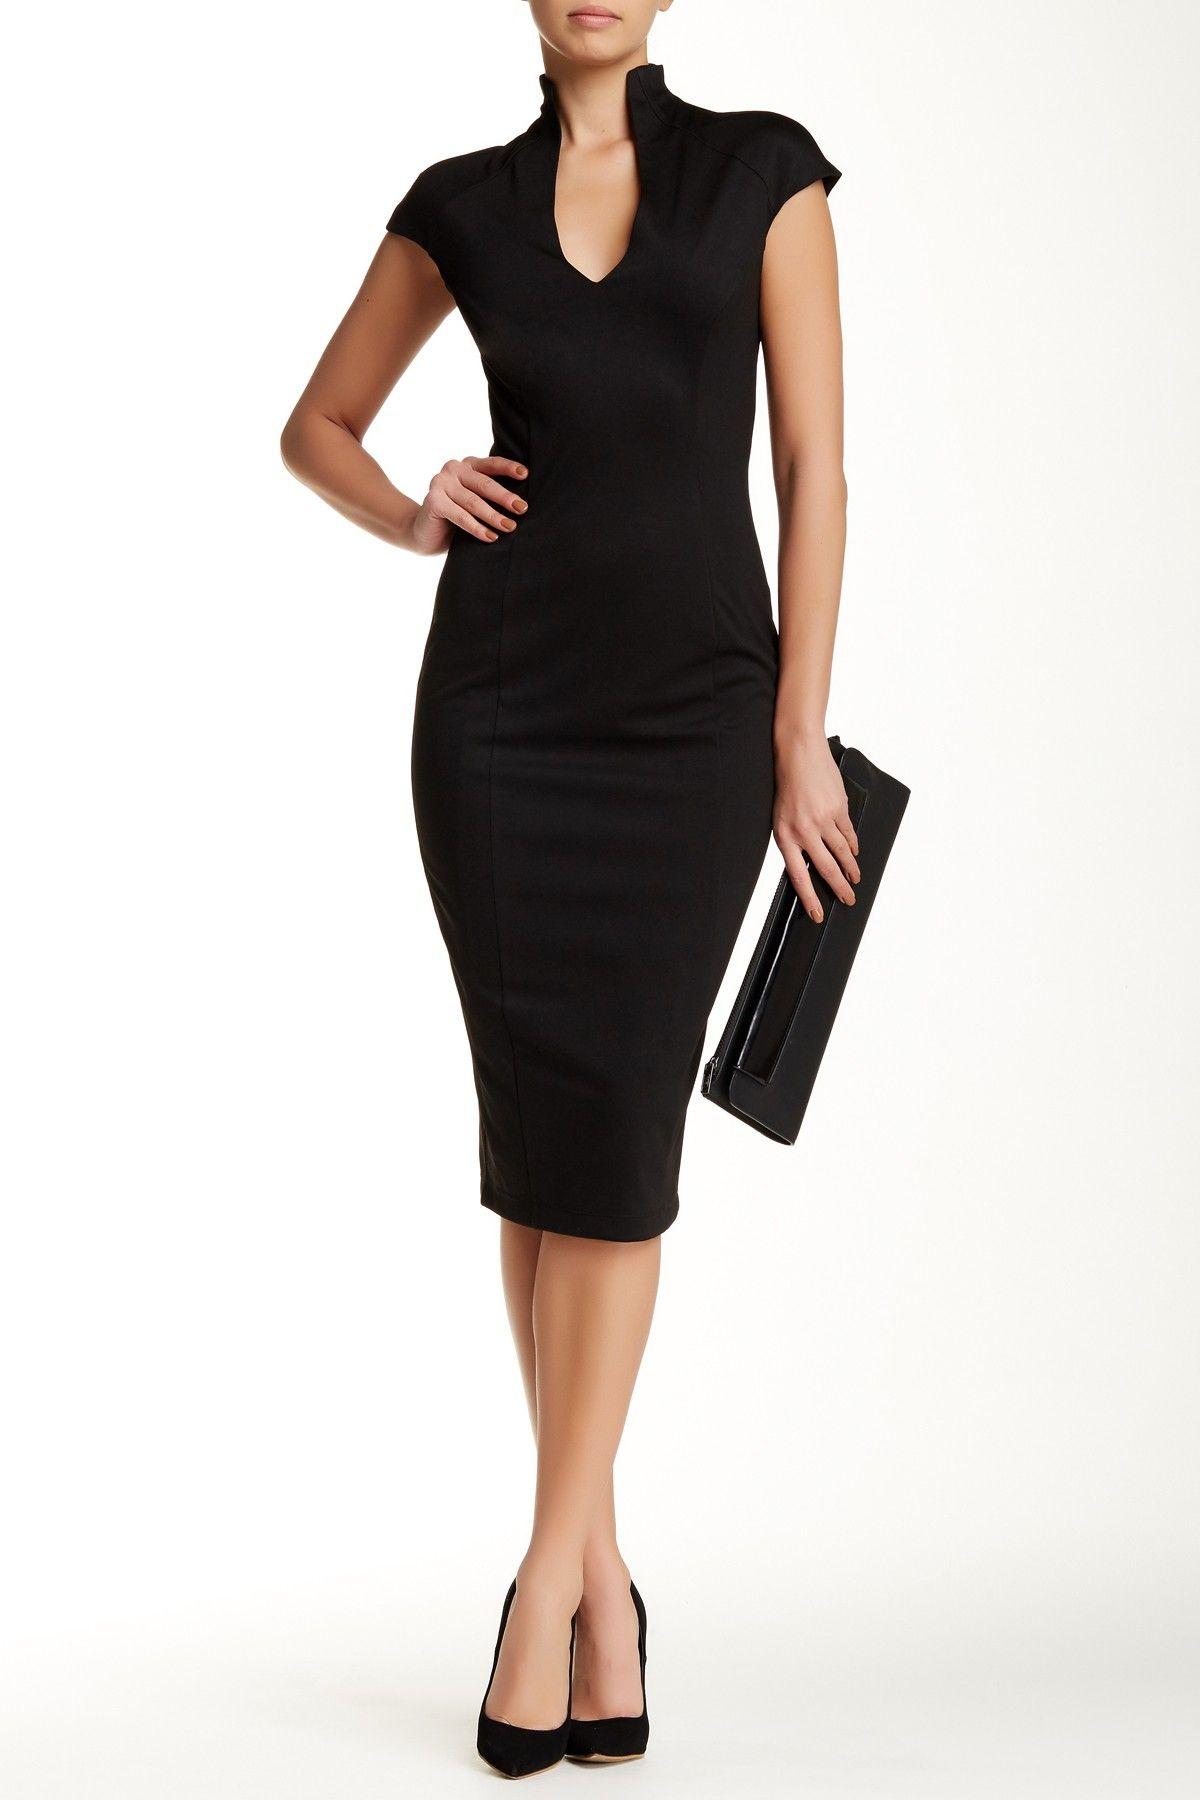 Alexia Admor Scuba Midi Sheath Dress Nordstrom Rack Black Dresses Classy Classy Dress Black Dress [ 1800 x 1200 Pixel ]